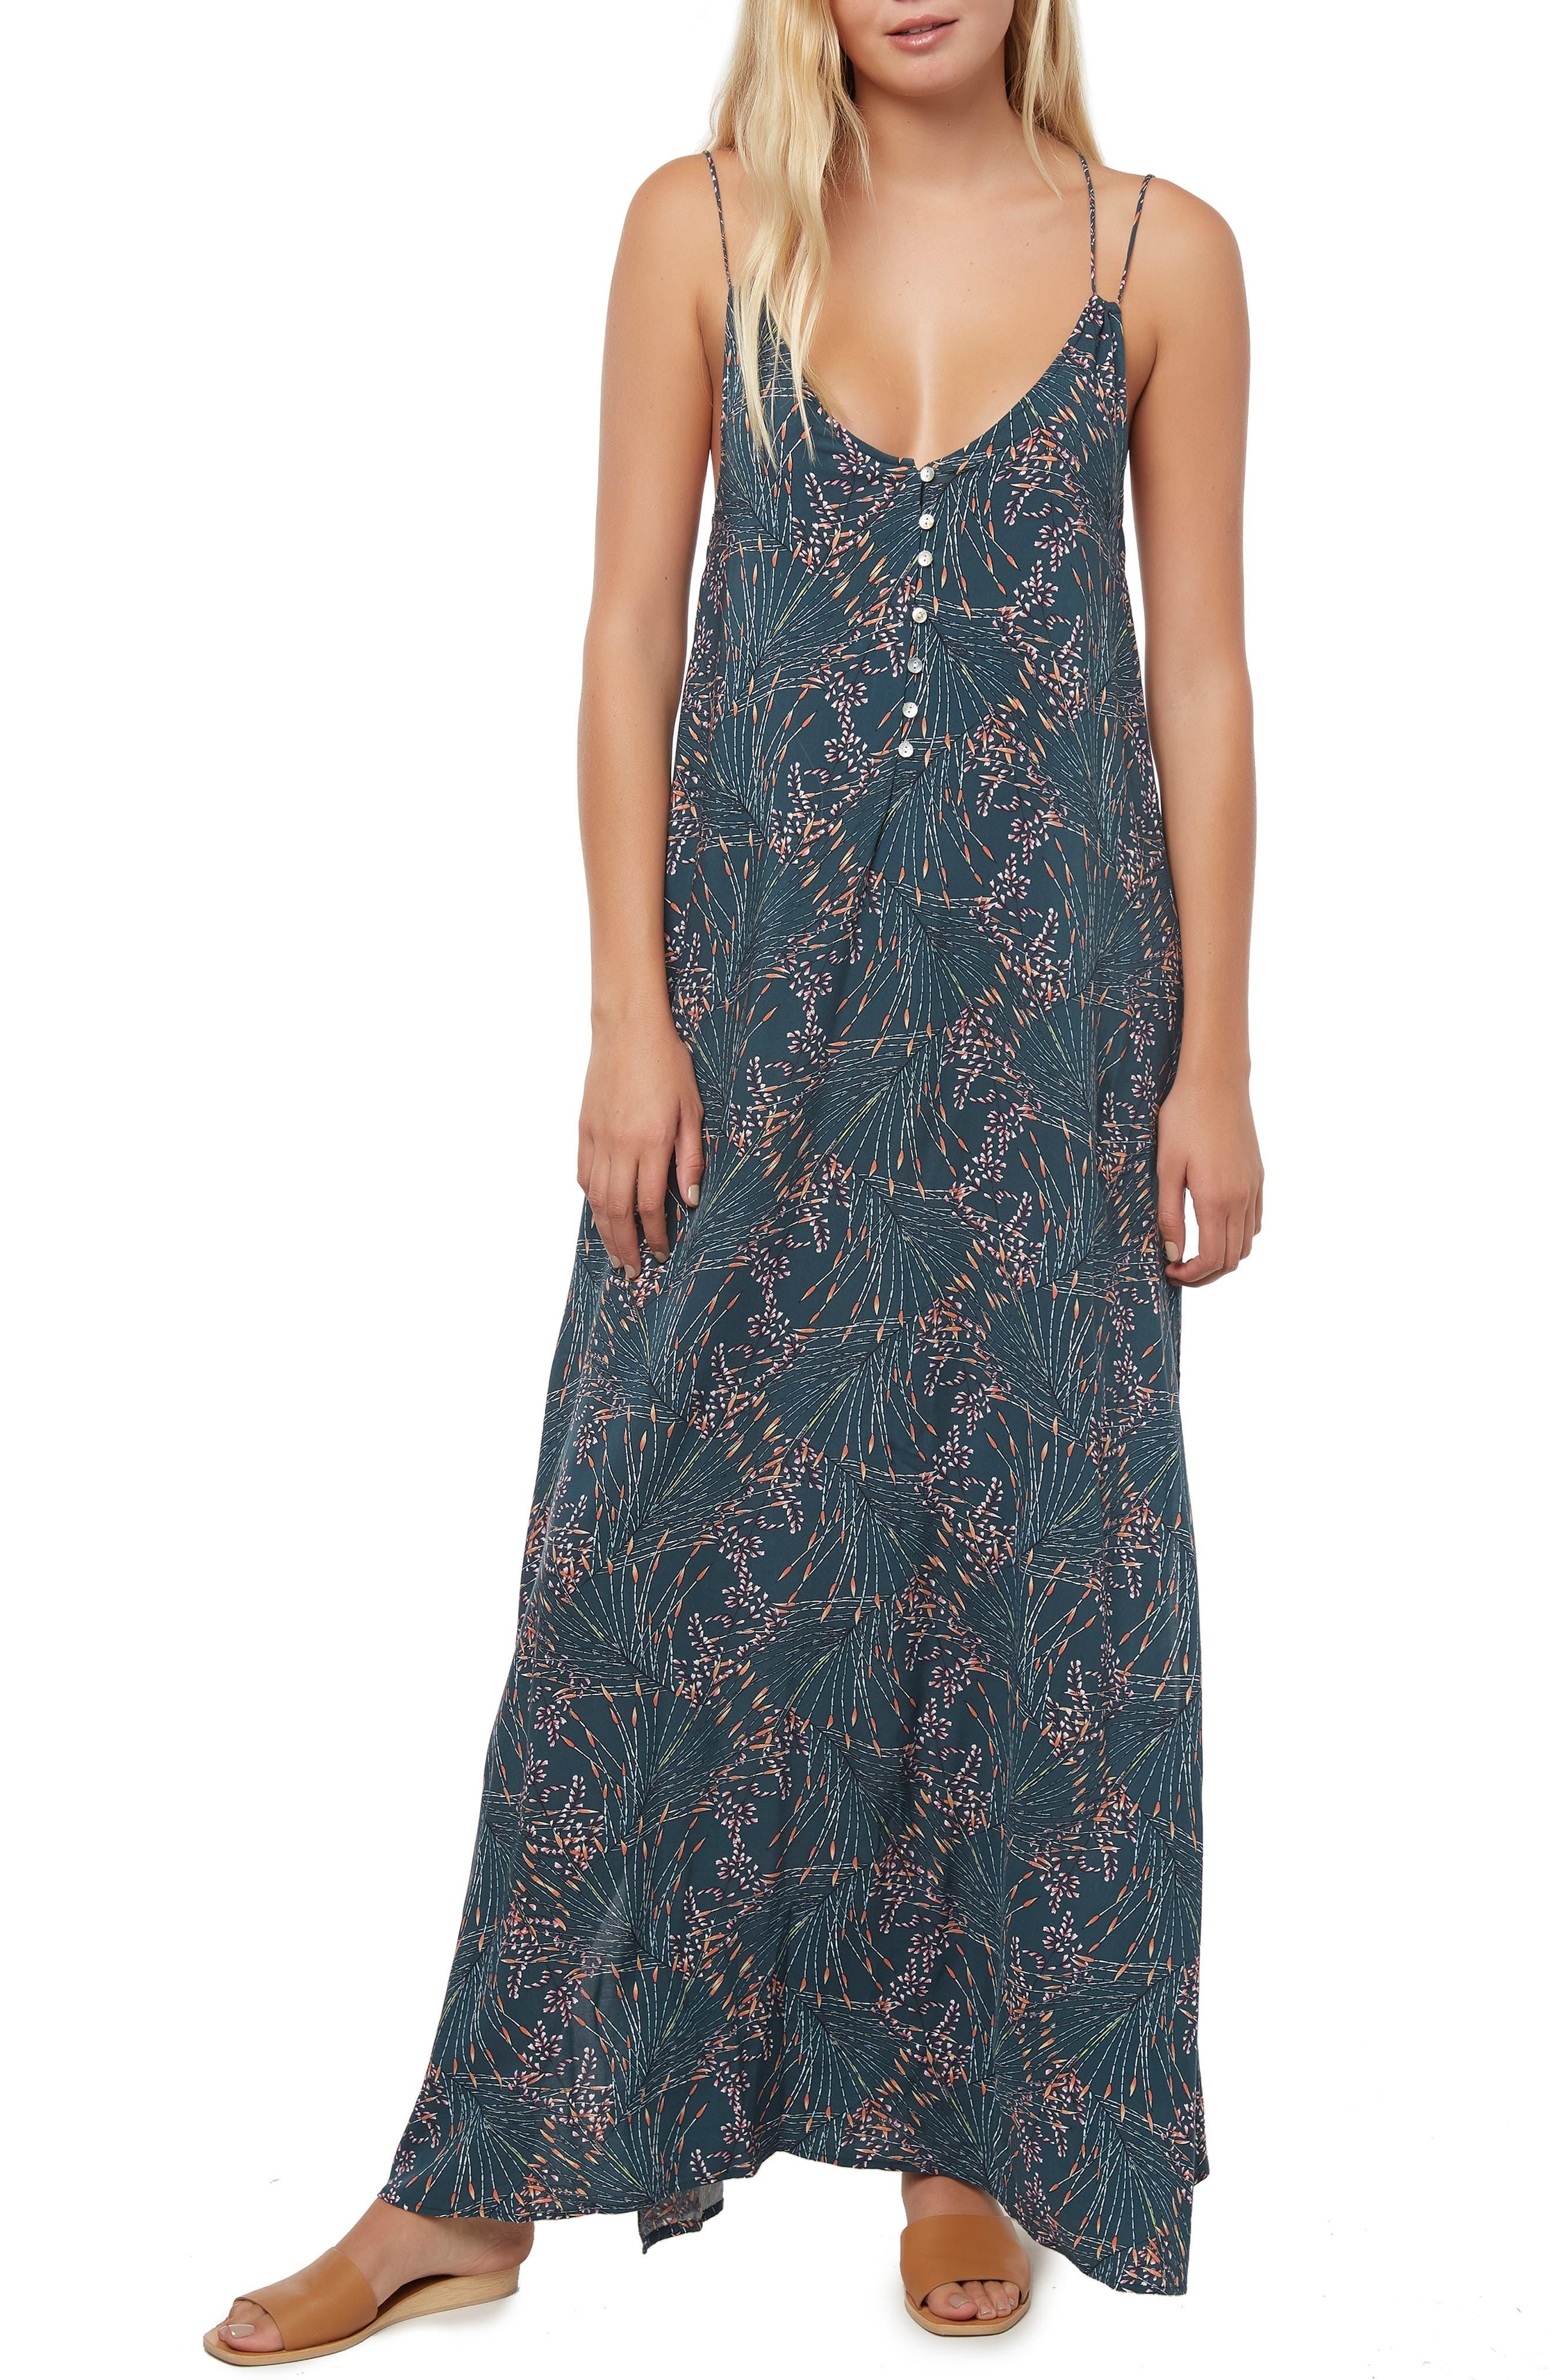 O'NEILL,                             Breanna Maxi Dress,                             Alternate thumbnail 5, color,                             STARGAZER